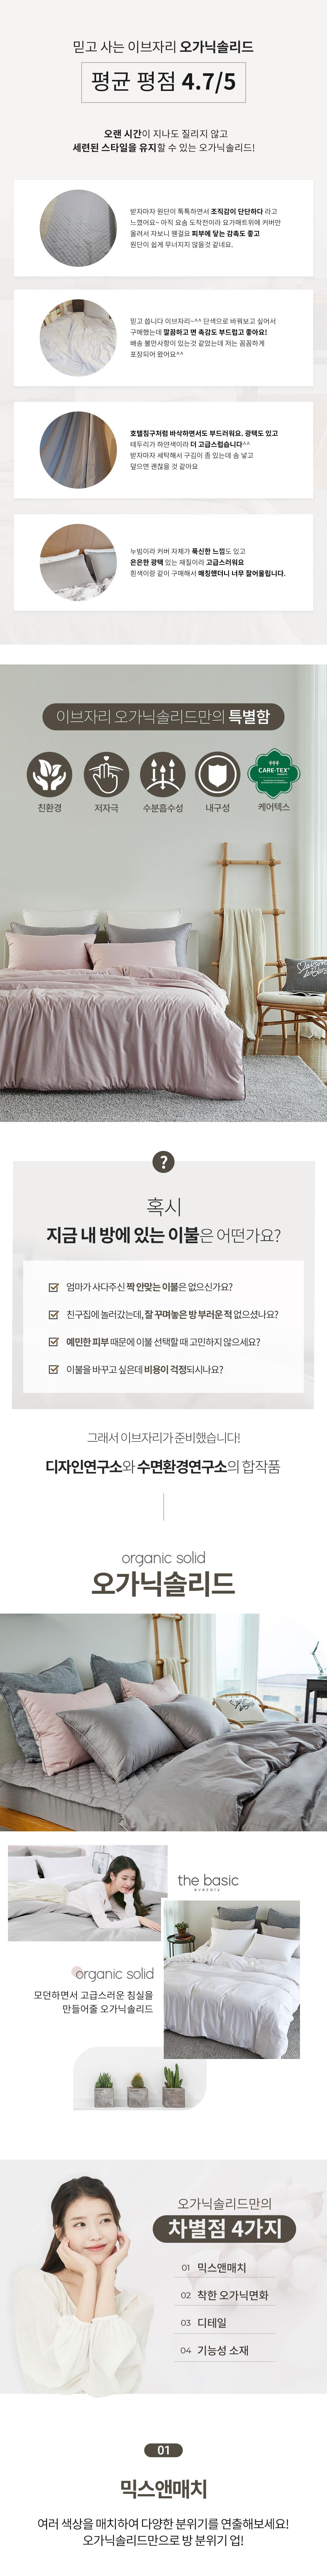 21HS리뉴얼_오가닉솔리드-베개커버1(수정)_02.jpg